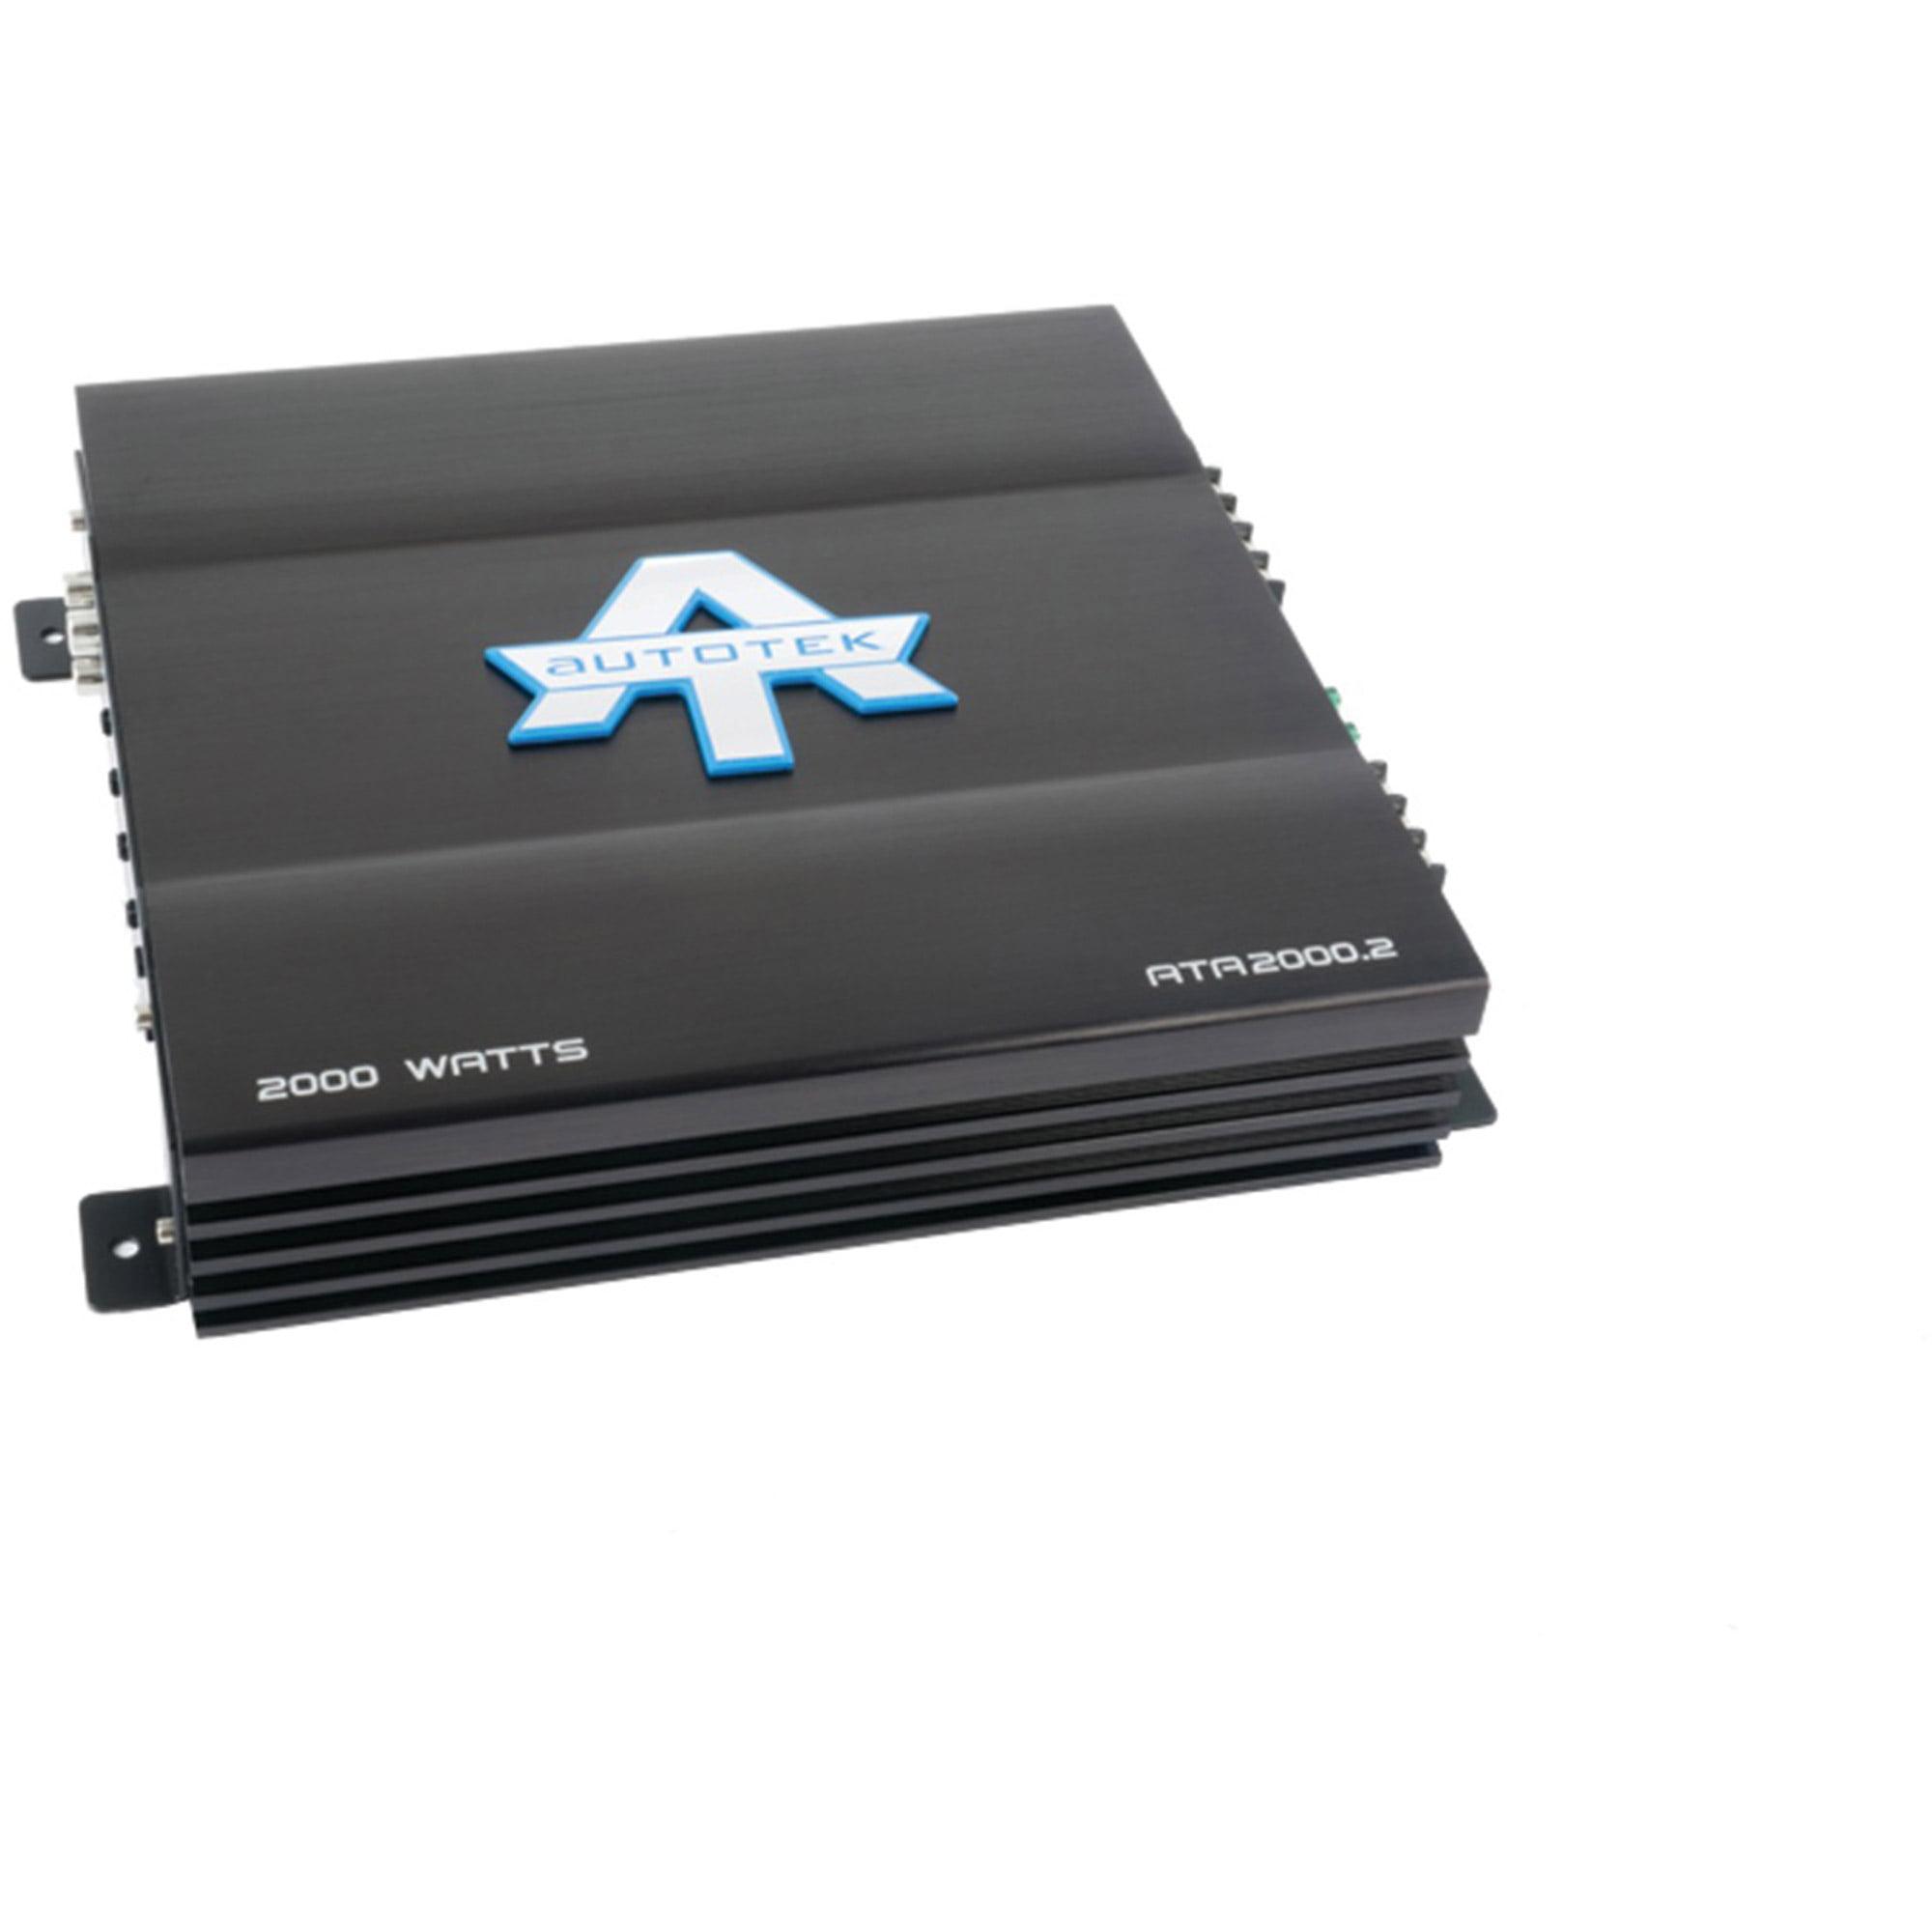 Autotek Amp Wiring Diagram - Trusted Wiring Diagram